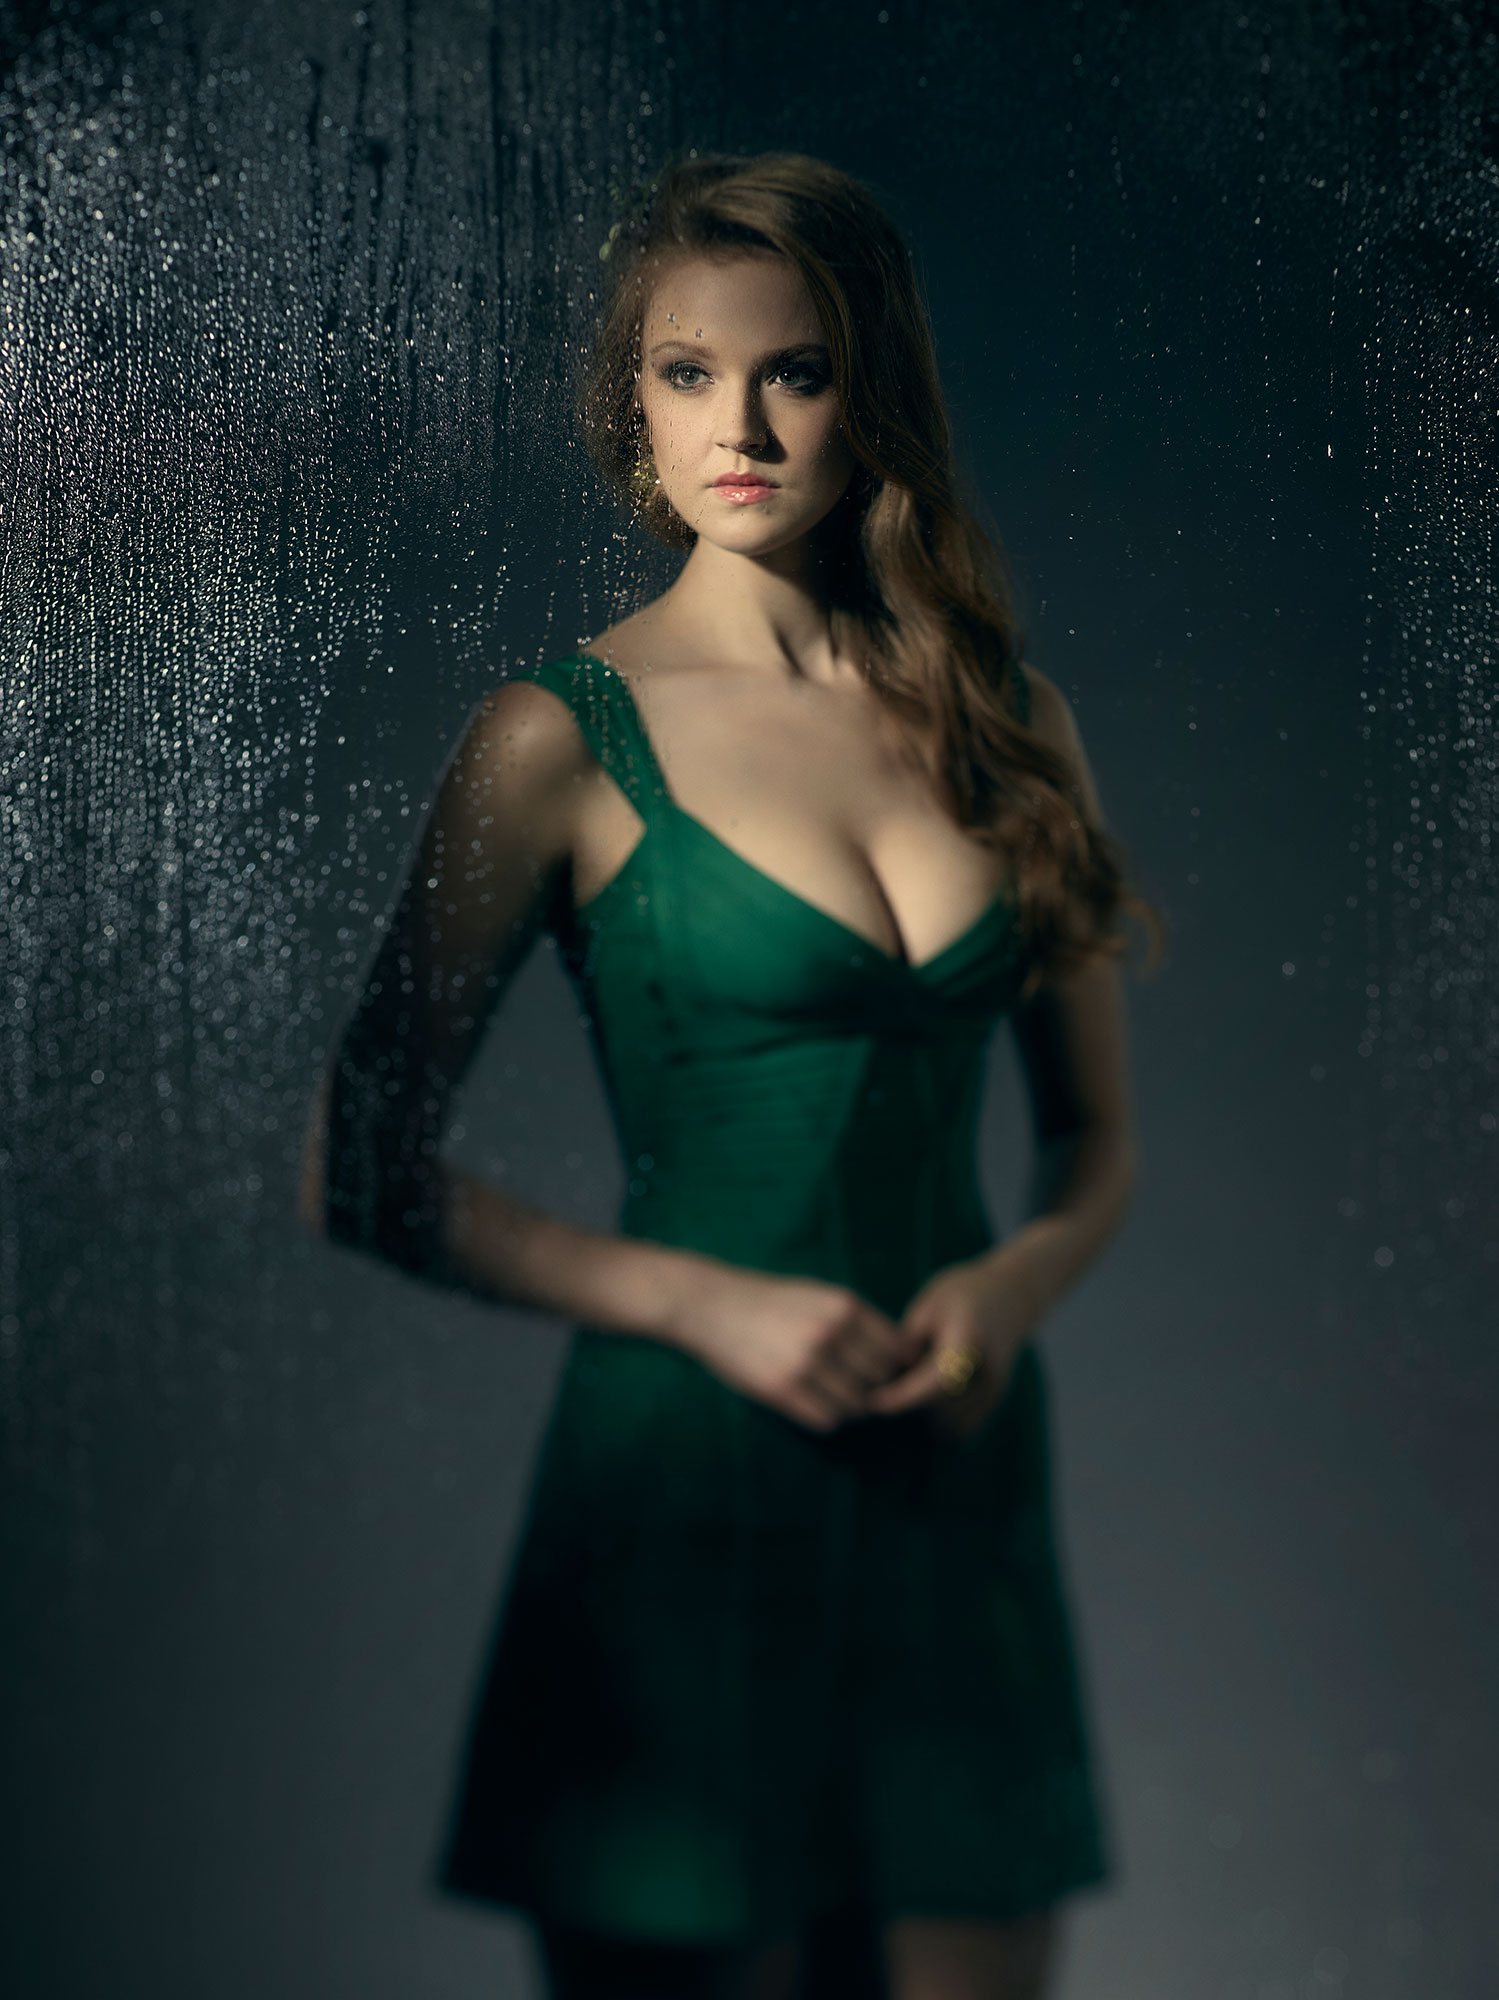 Maggie Geha as Poison Ivy